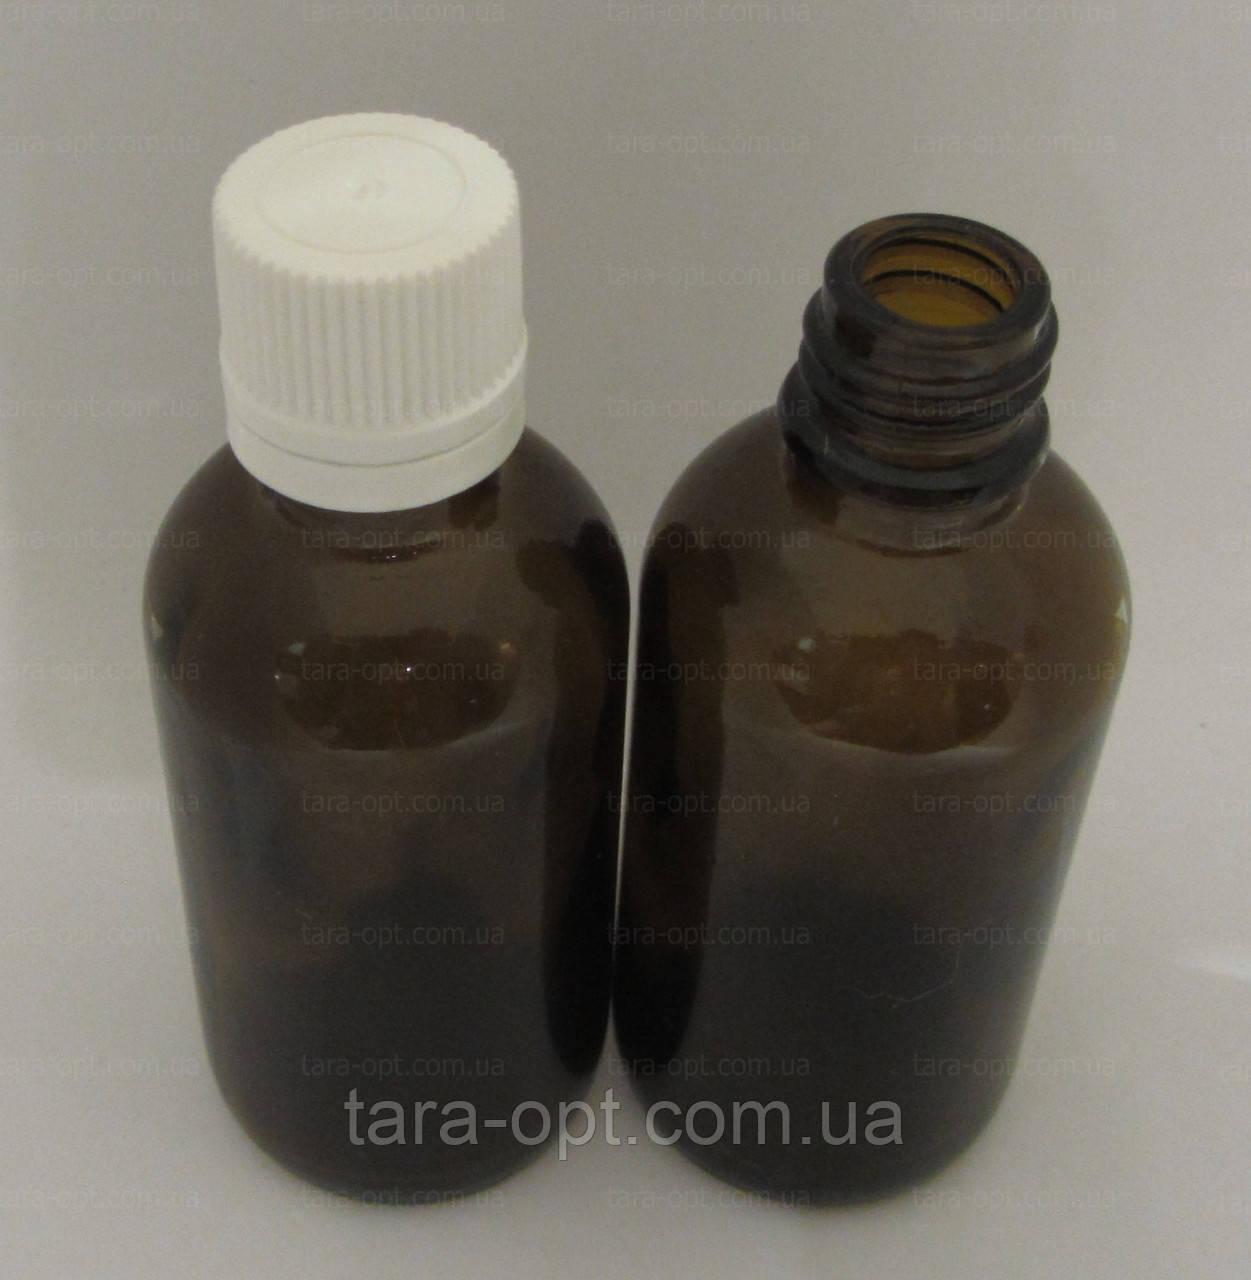 Флакон из стекла 50 мл, без дозатора бутылочка